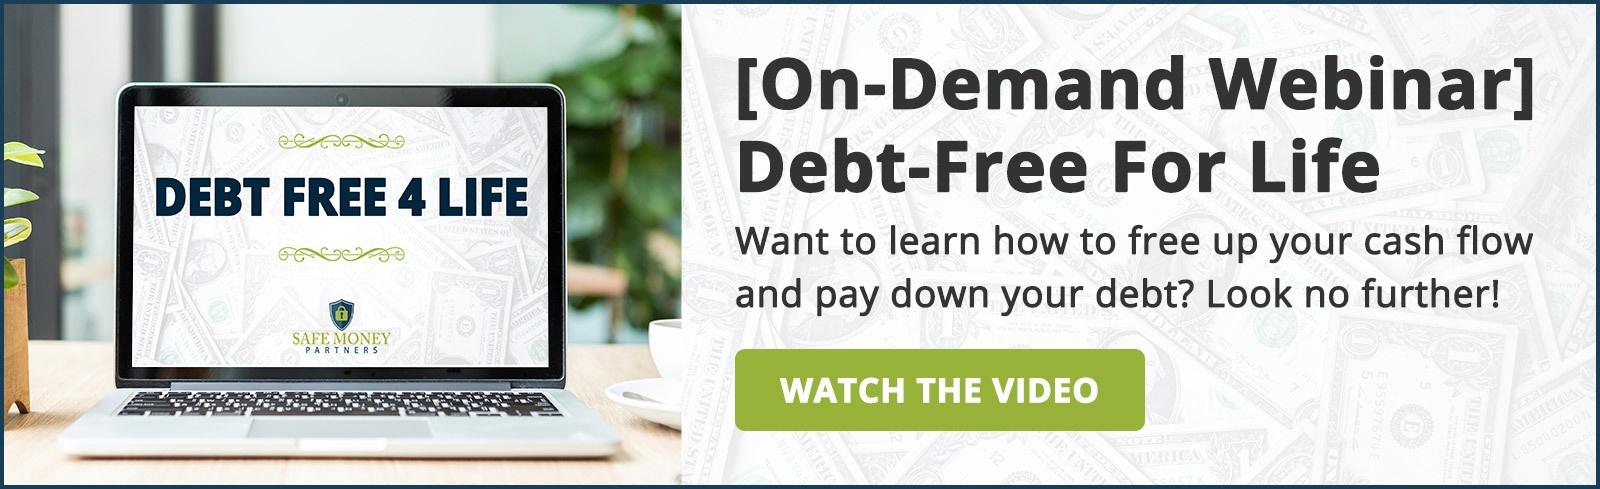 Debt-Free-For-Life-Webinar